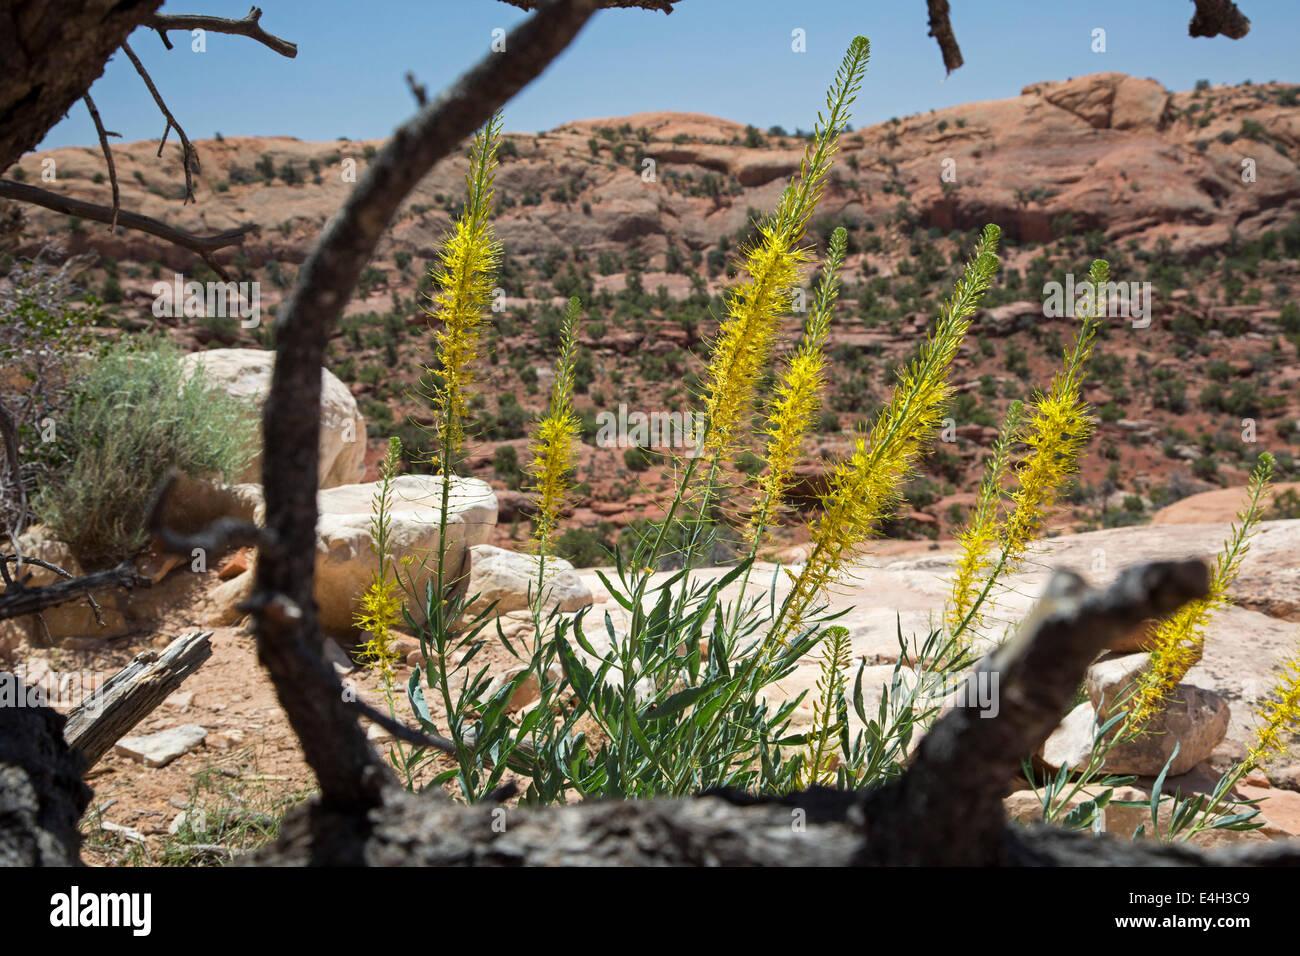 Moab, Utah - Prince's Plume (Stanleya pinnata) blooming in Canyonlands National Park. - Stock Image